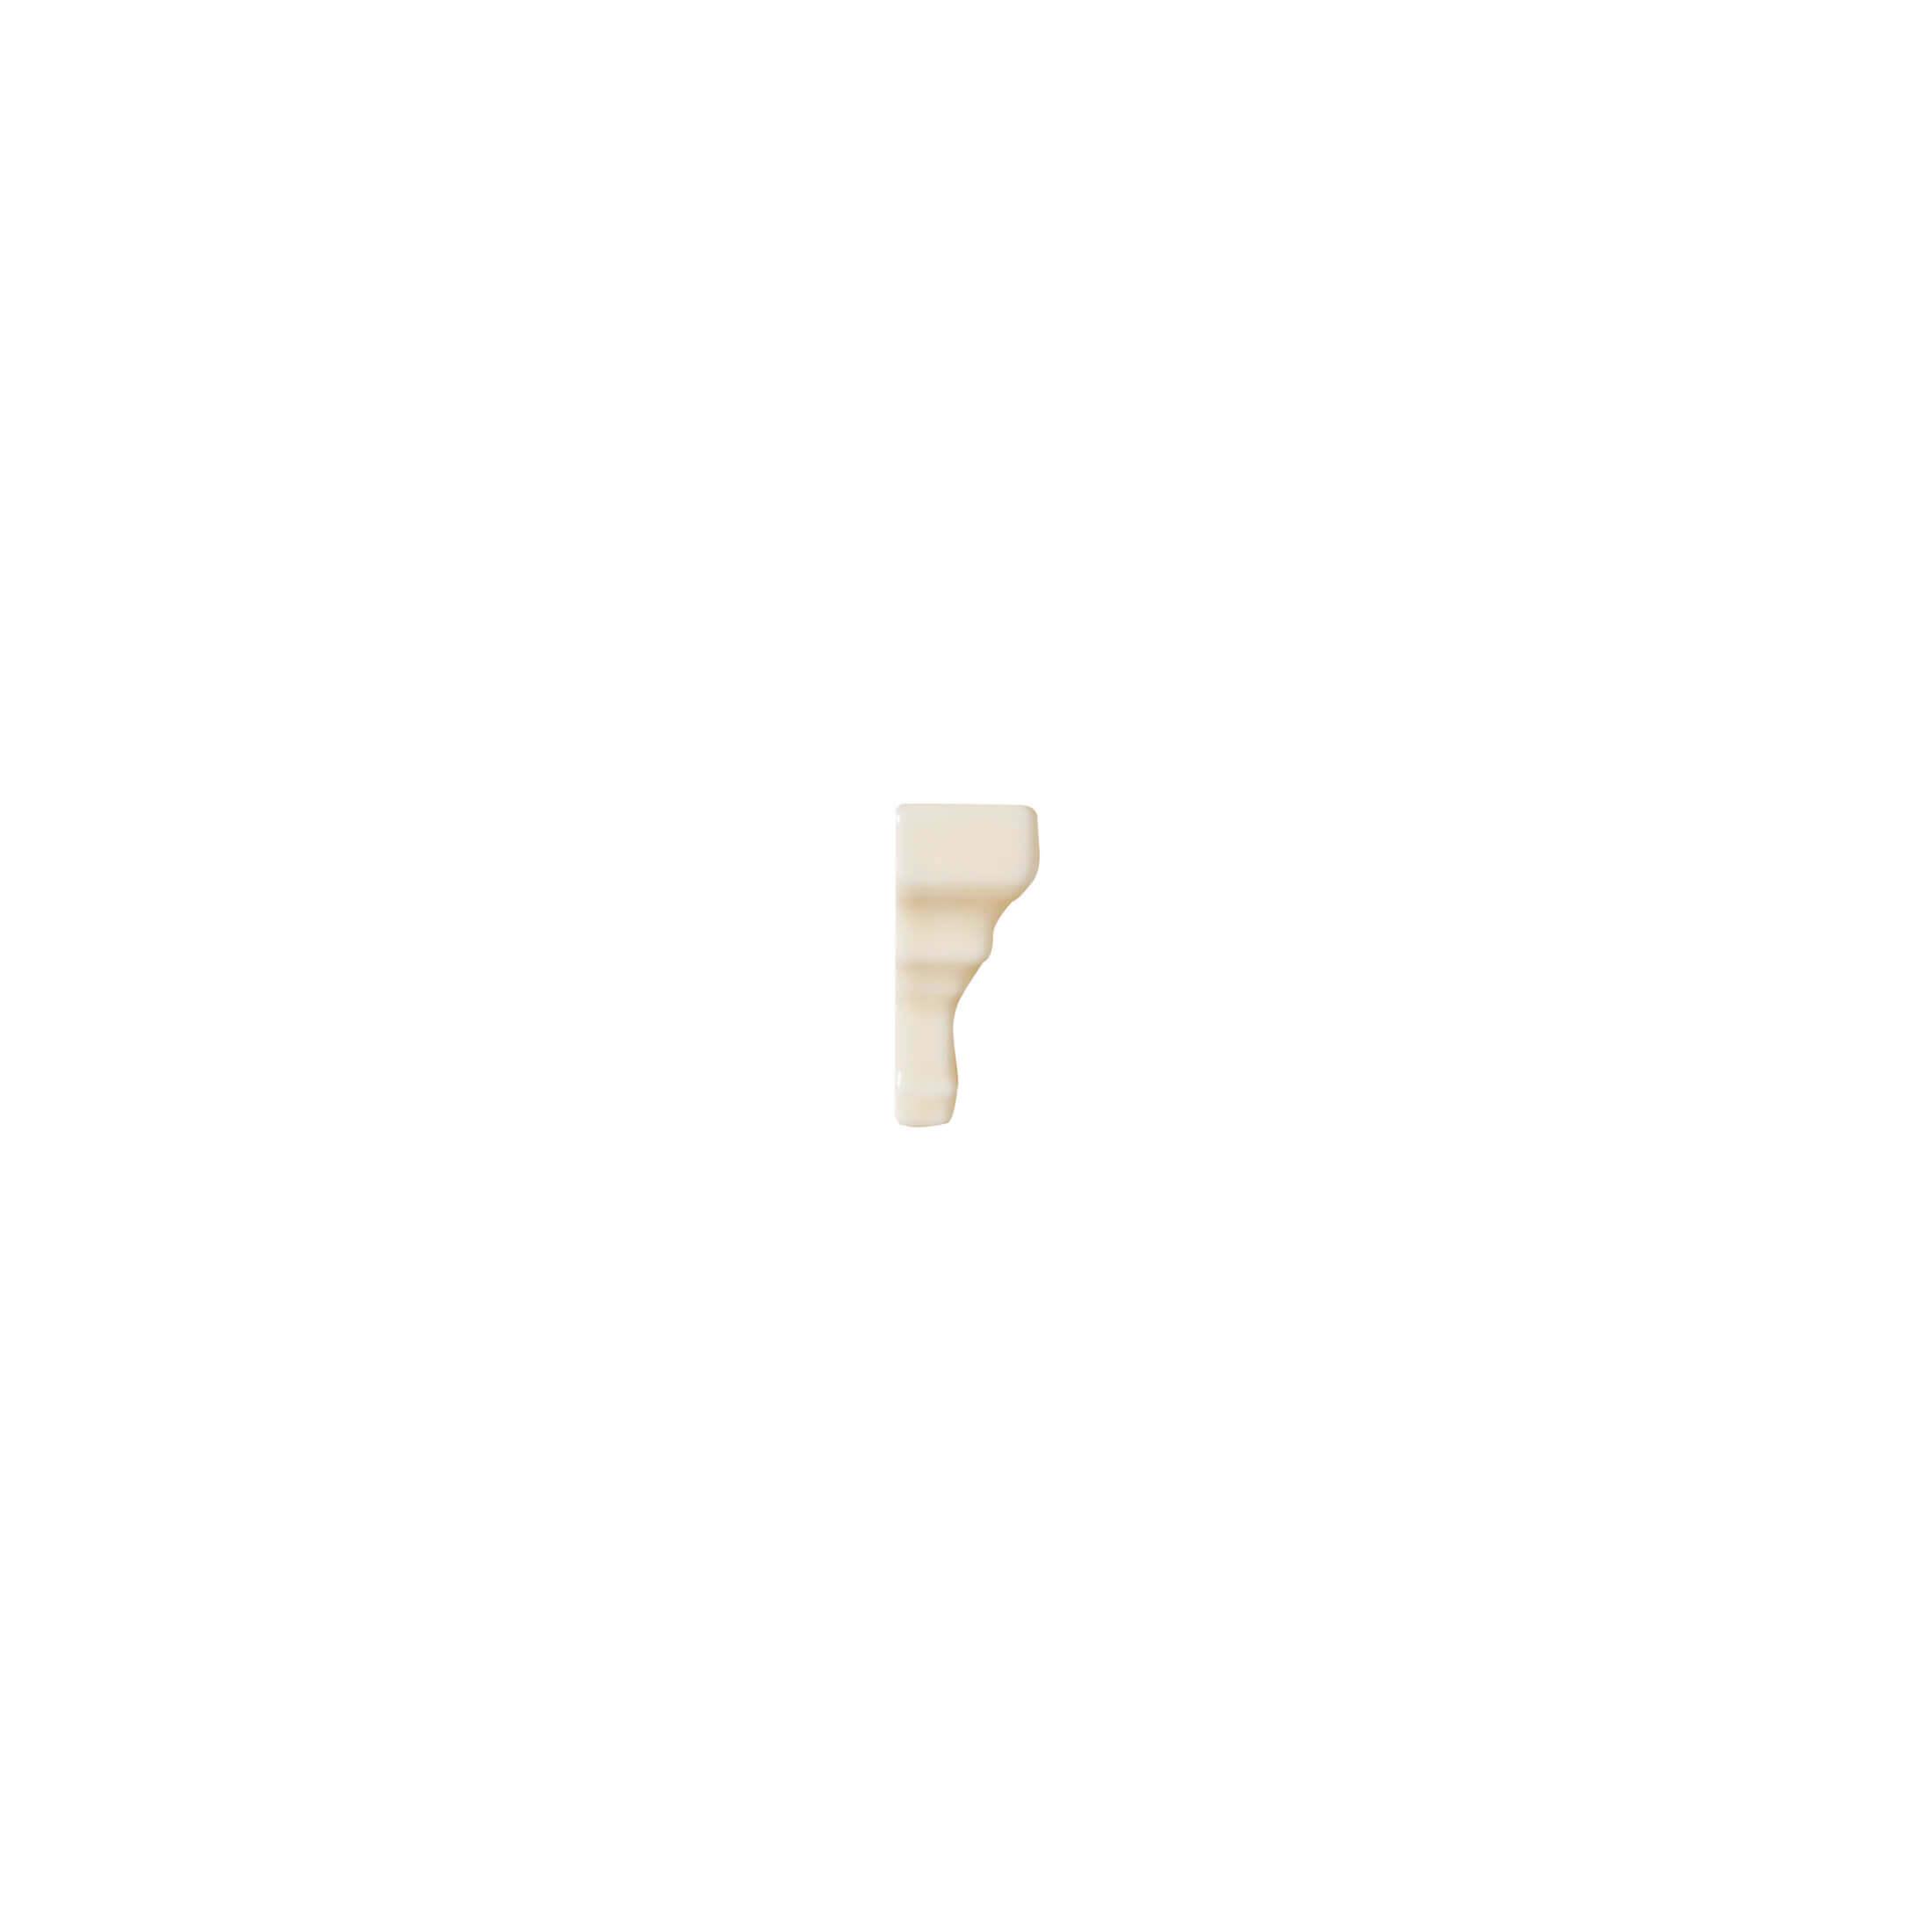 ADST5230 - ANGULO EXTERIOR CORNISA - 5 cm X 19.8 cm